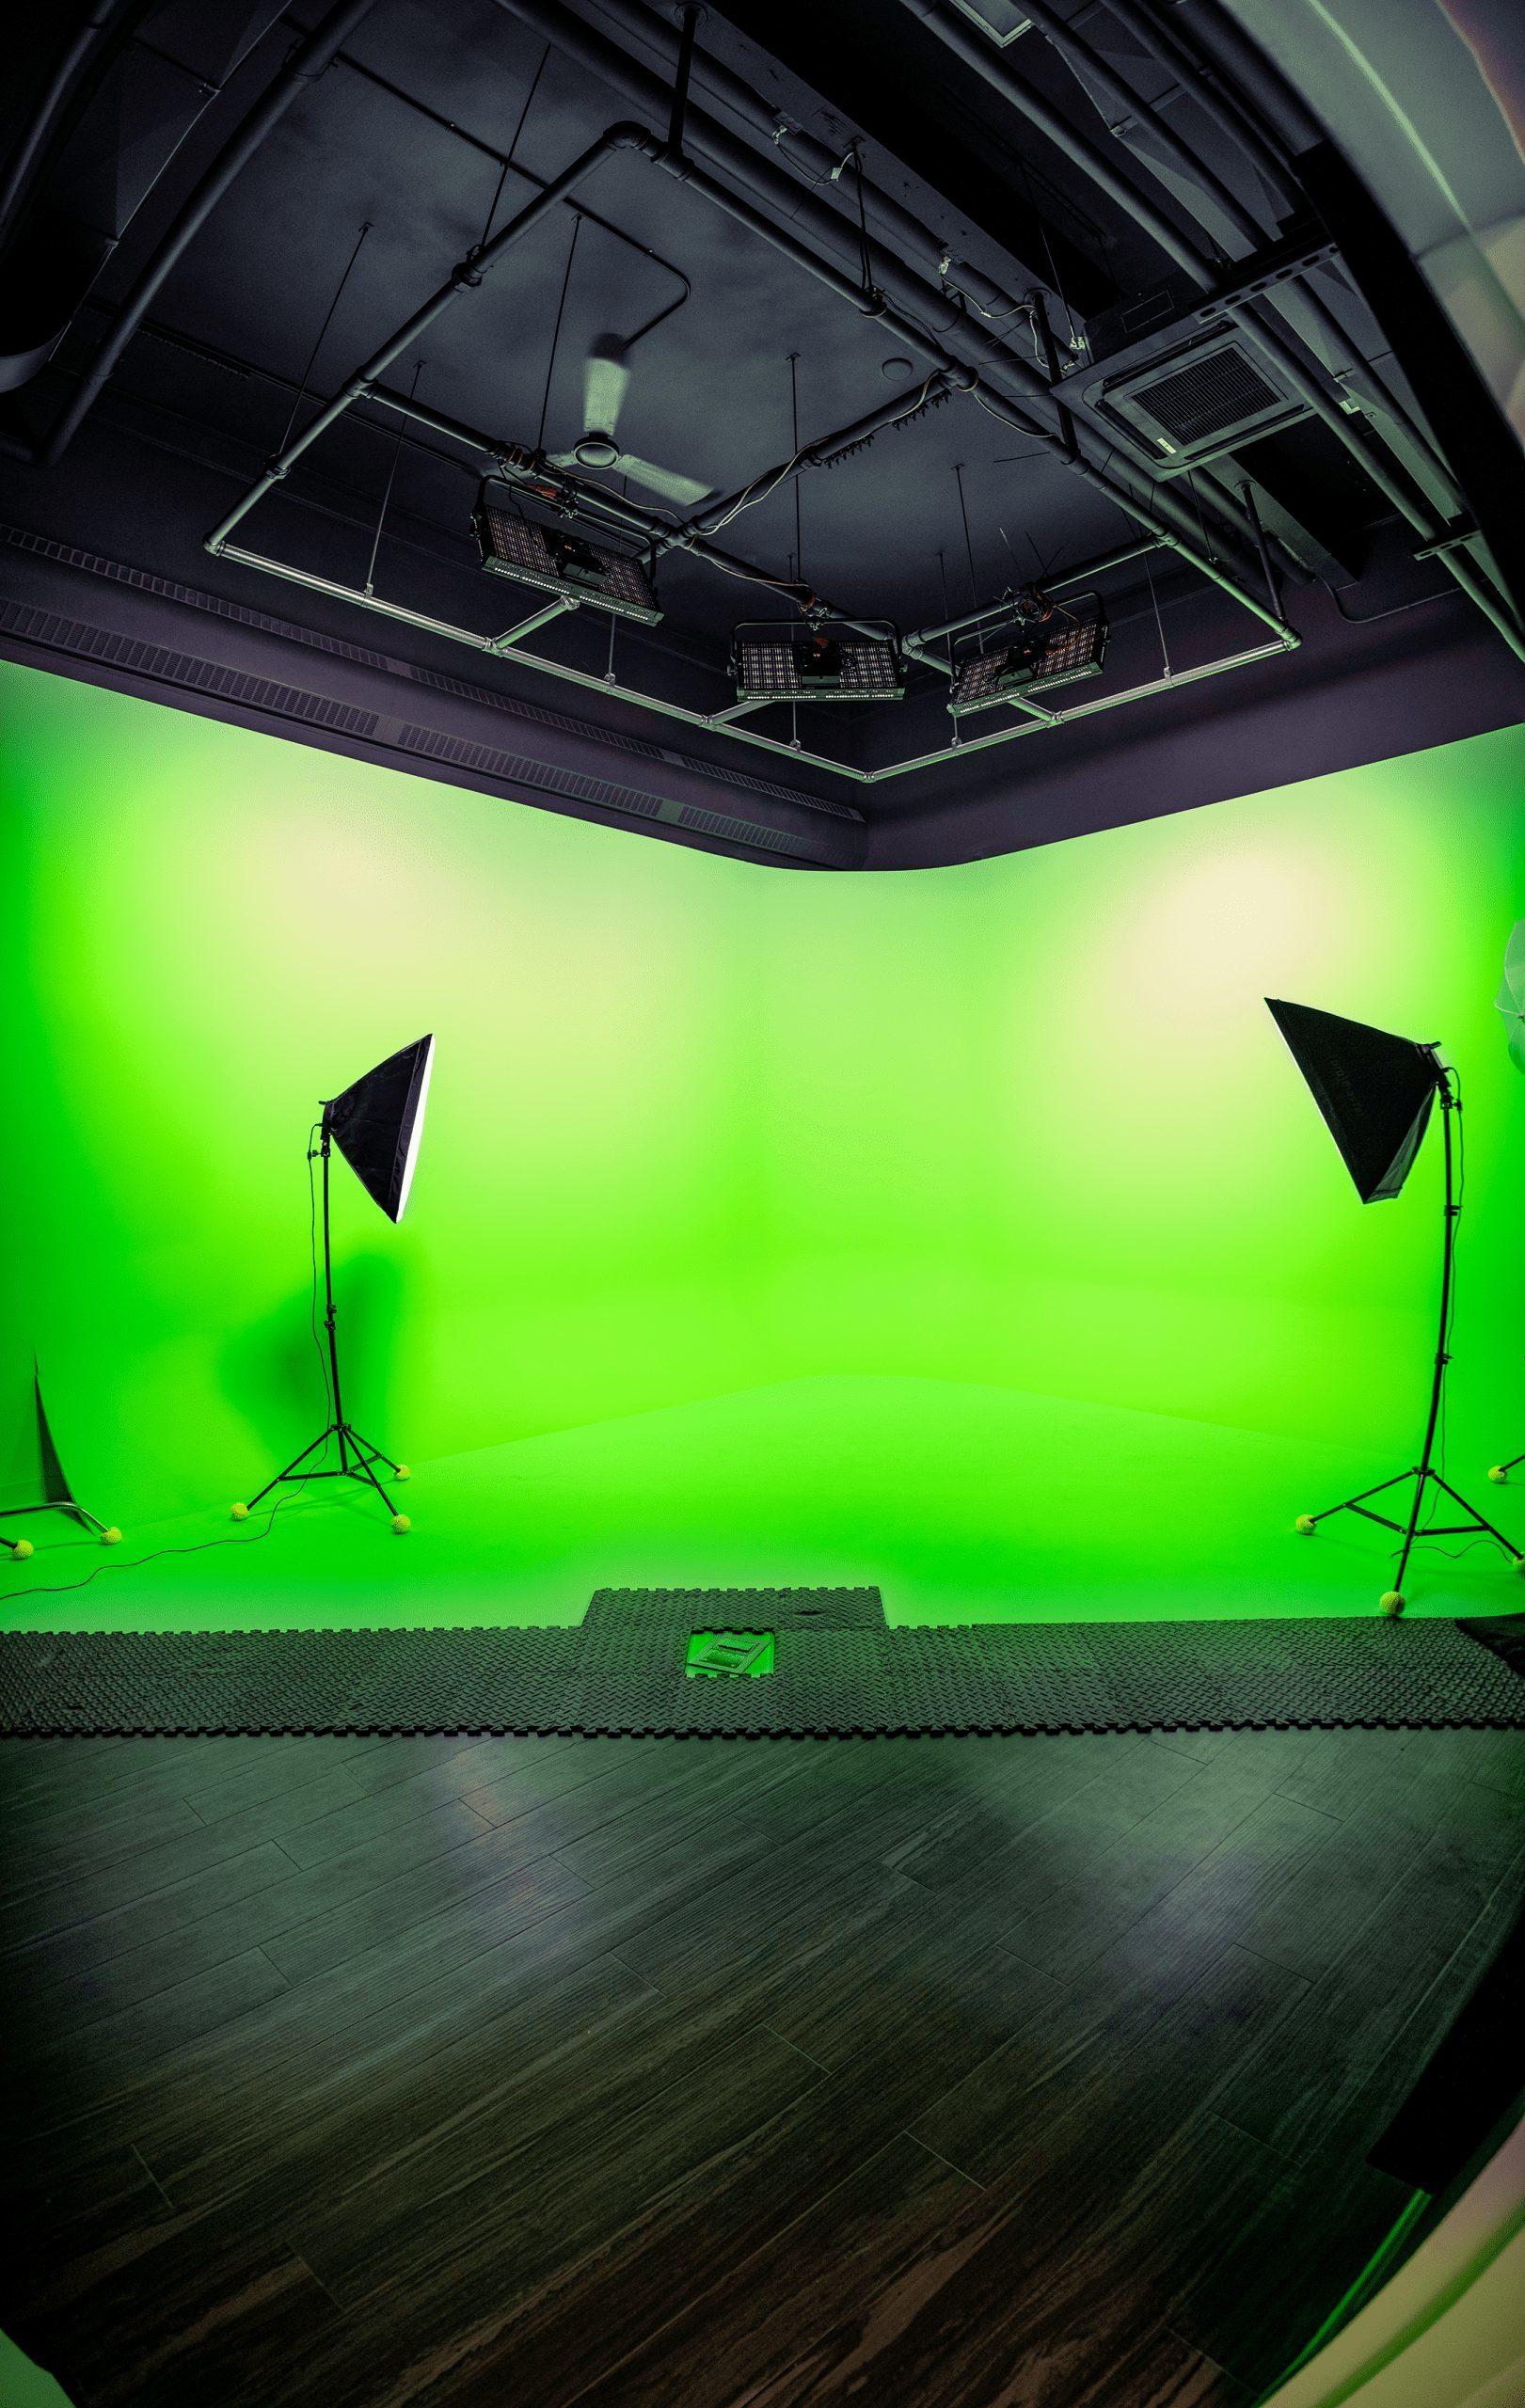 buzzmasters studio panoramic photo